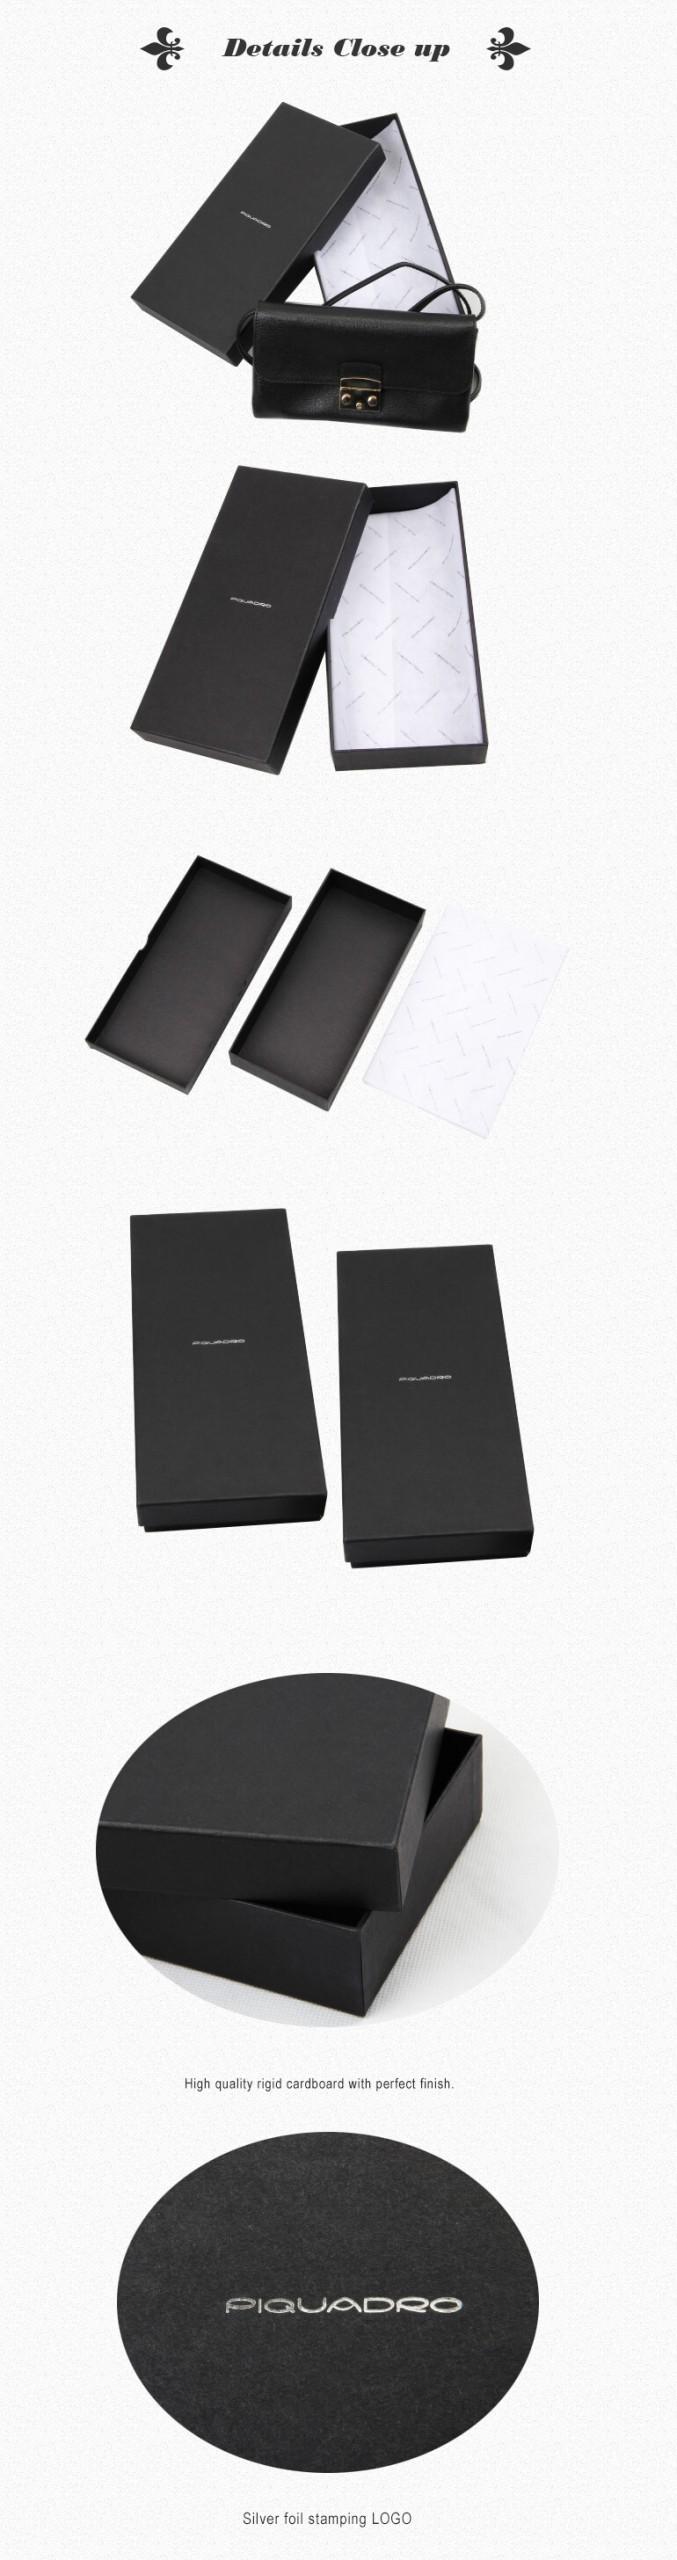 Mens' Wallet Packaging Box